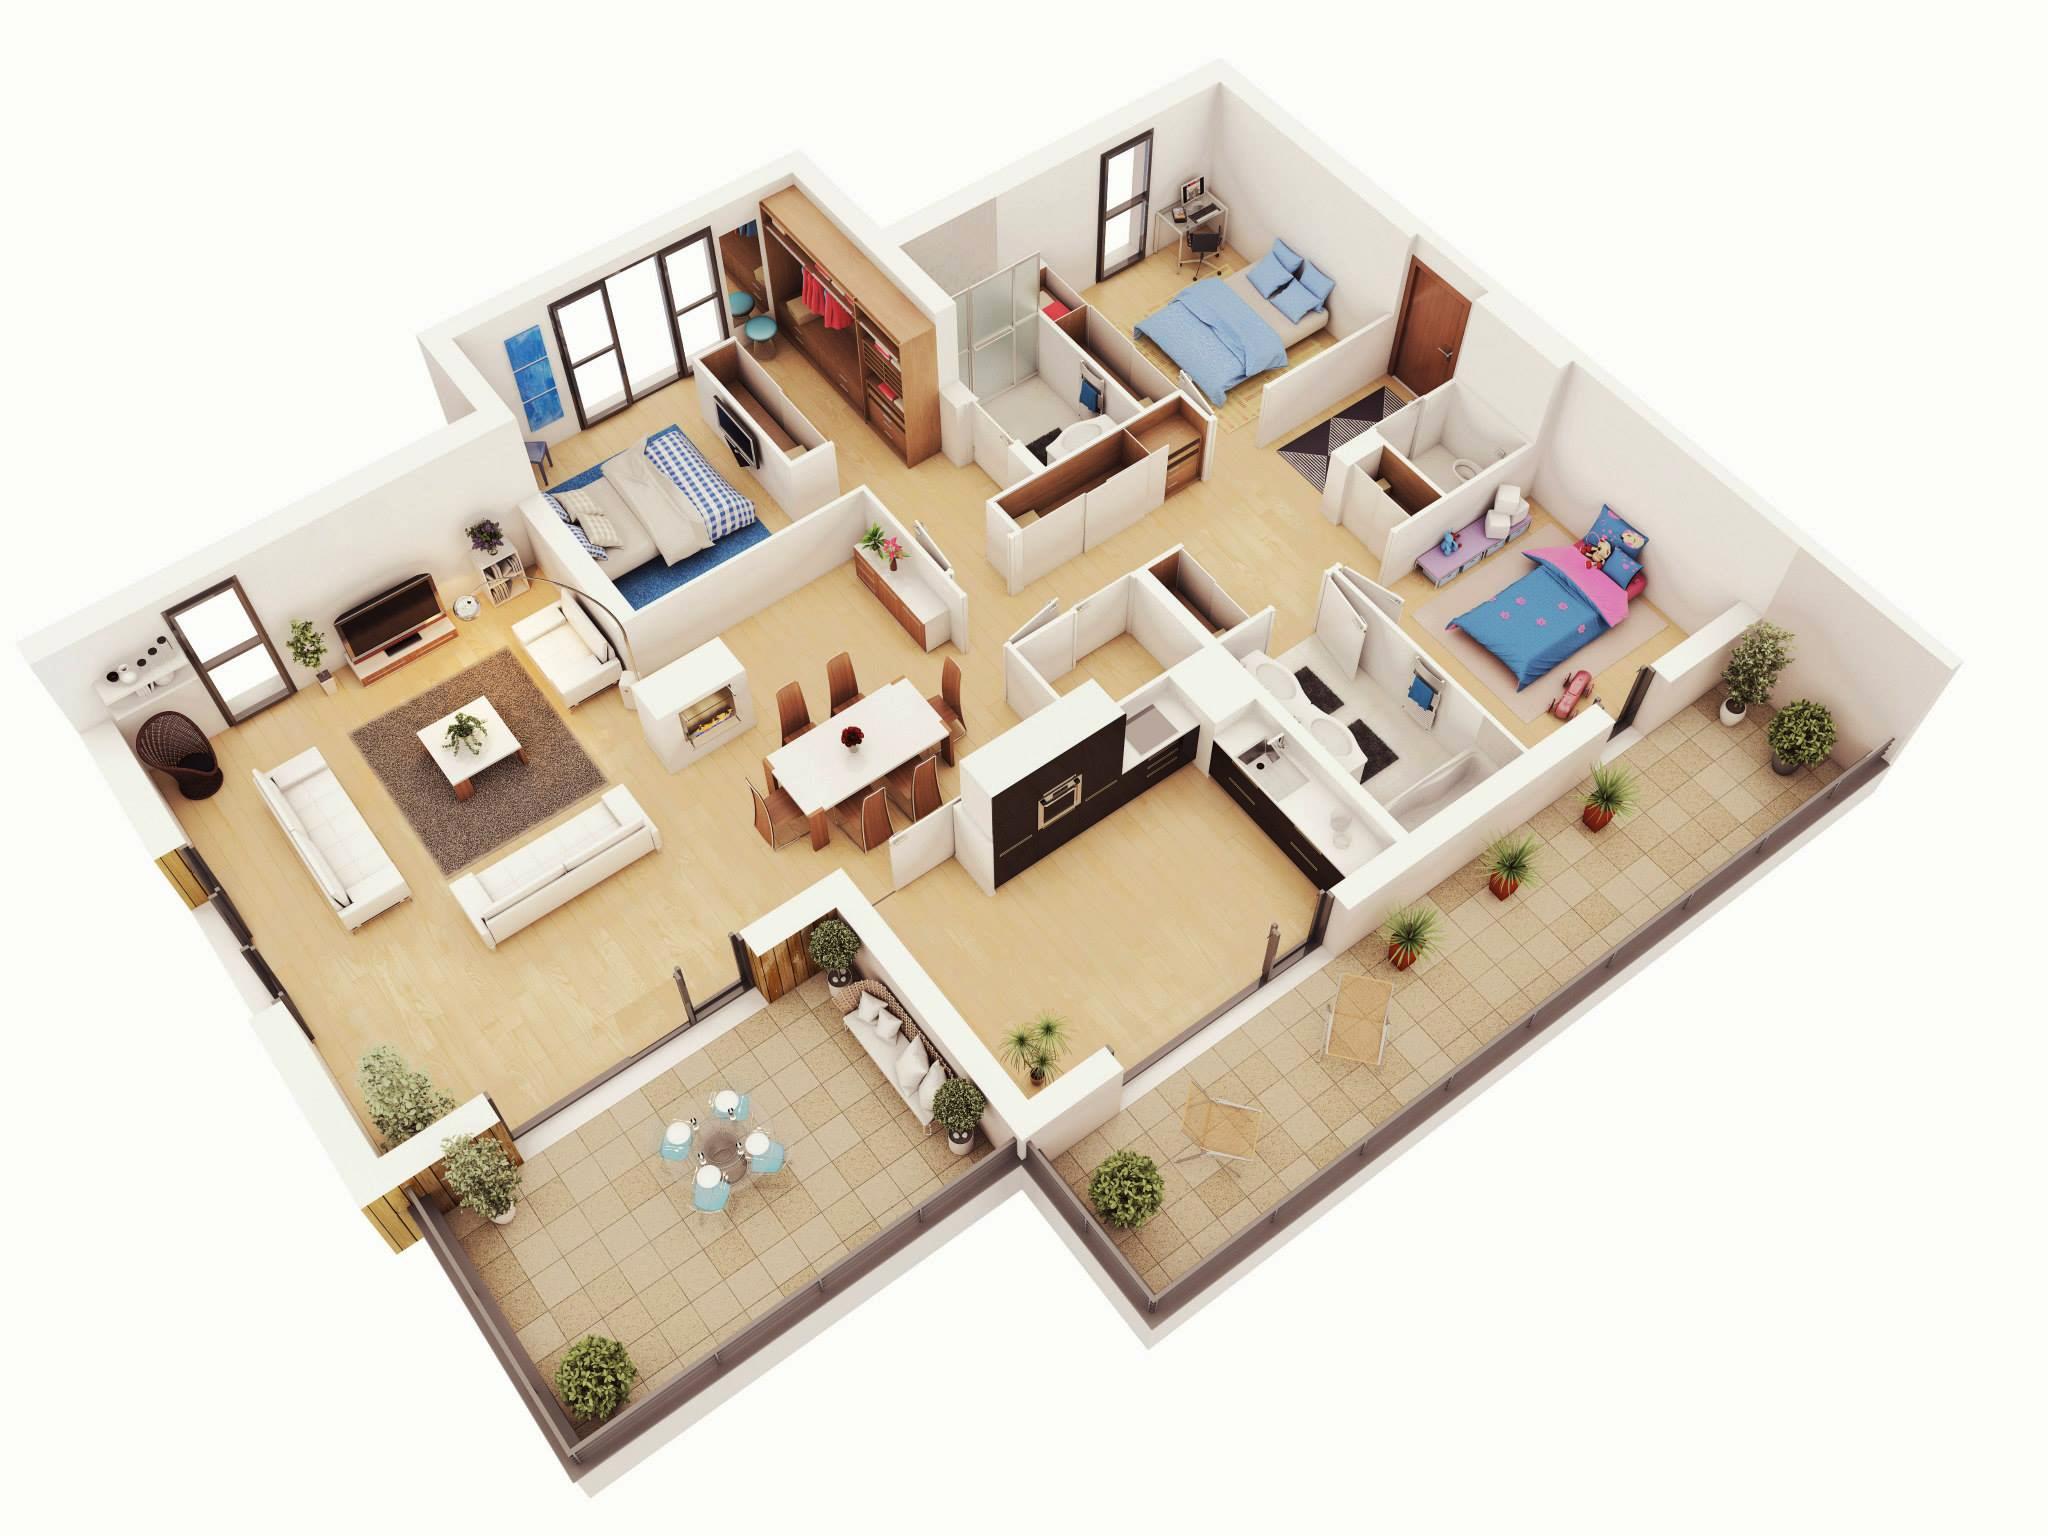 25 More 3 Bedroom 3D Floor Plans25 More 3 Bedroom 3D Floor Plans   3d  Architects and Building. 3 Bedroom House Designs 3d. Home Design Ideas